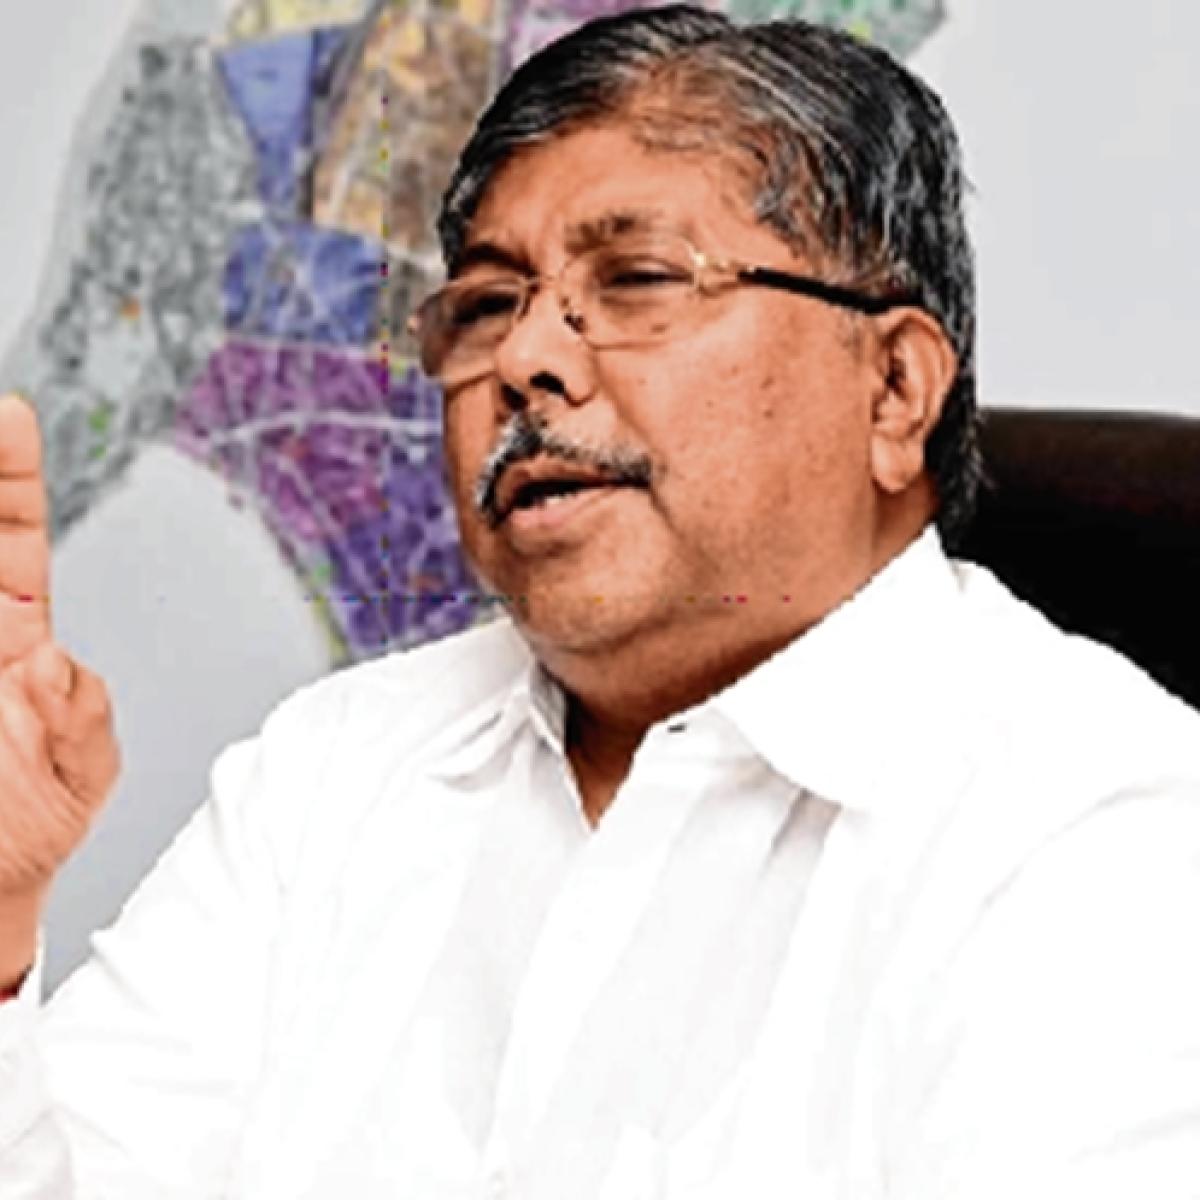 BJP's Chandrakant Patil, Mungantiwar to meet Shiv Sena leaders on seat-sharing